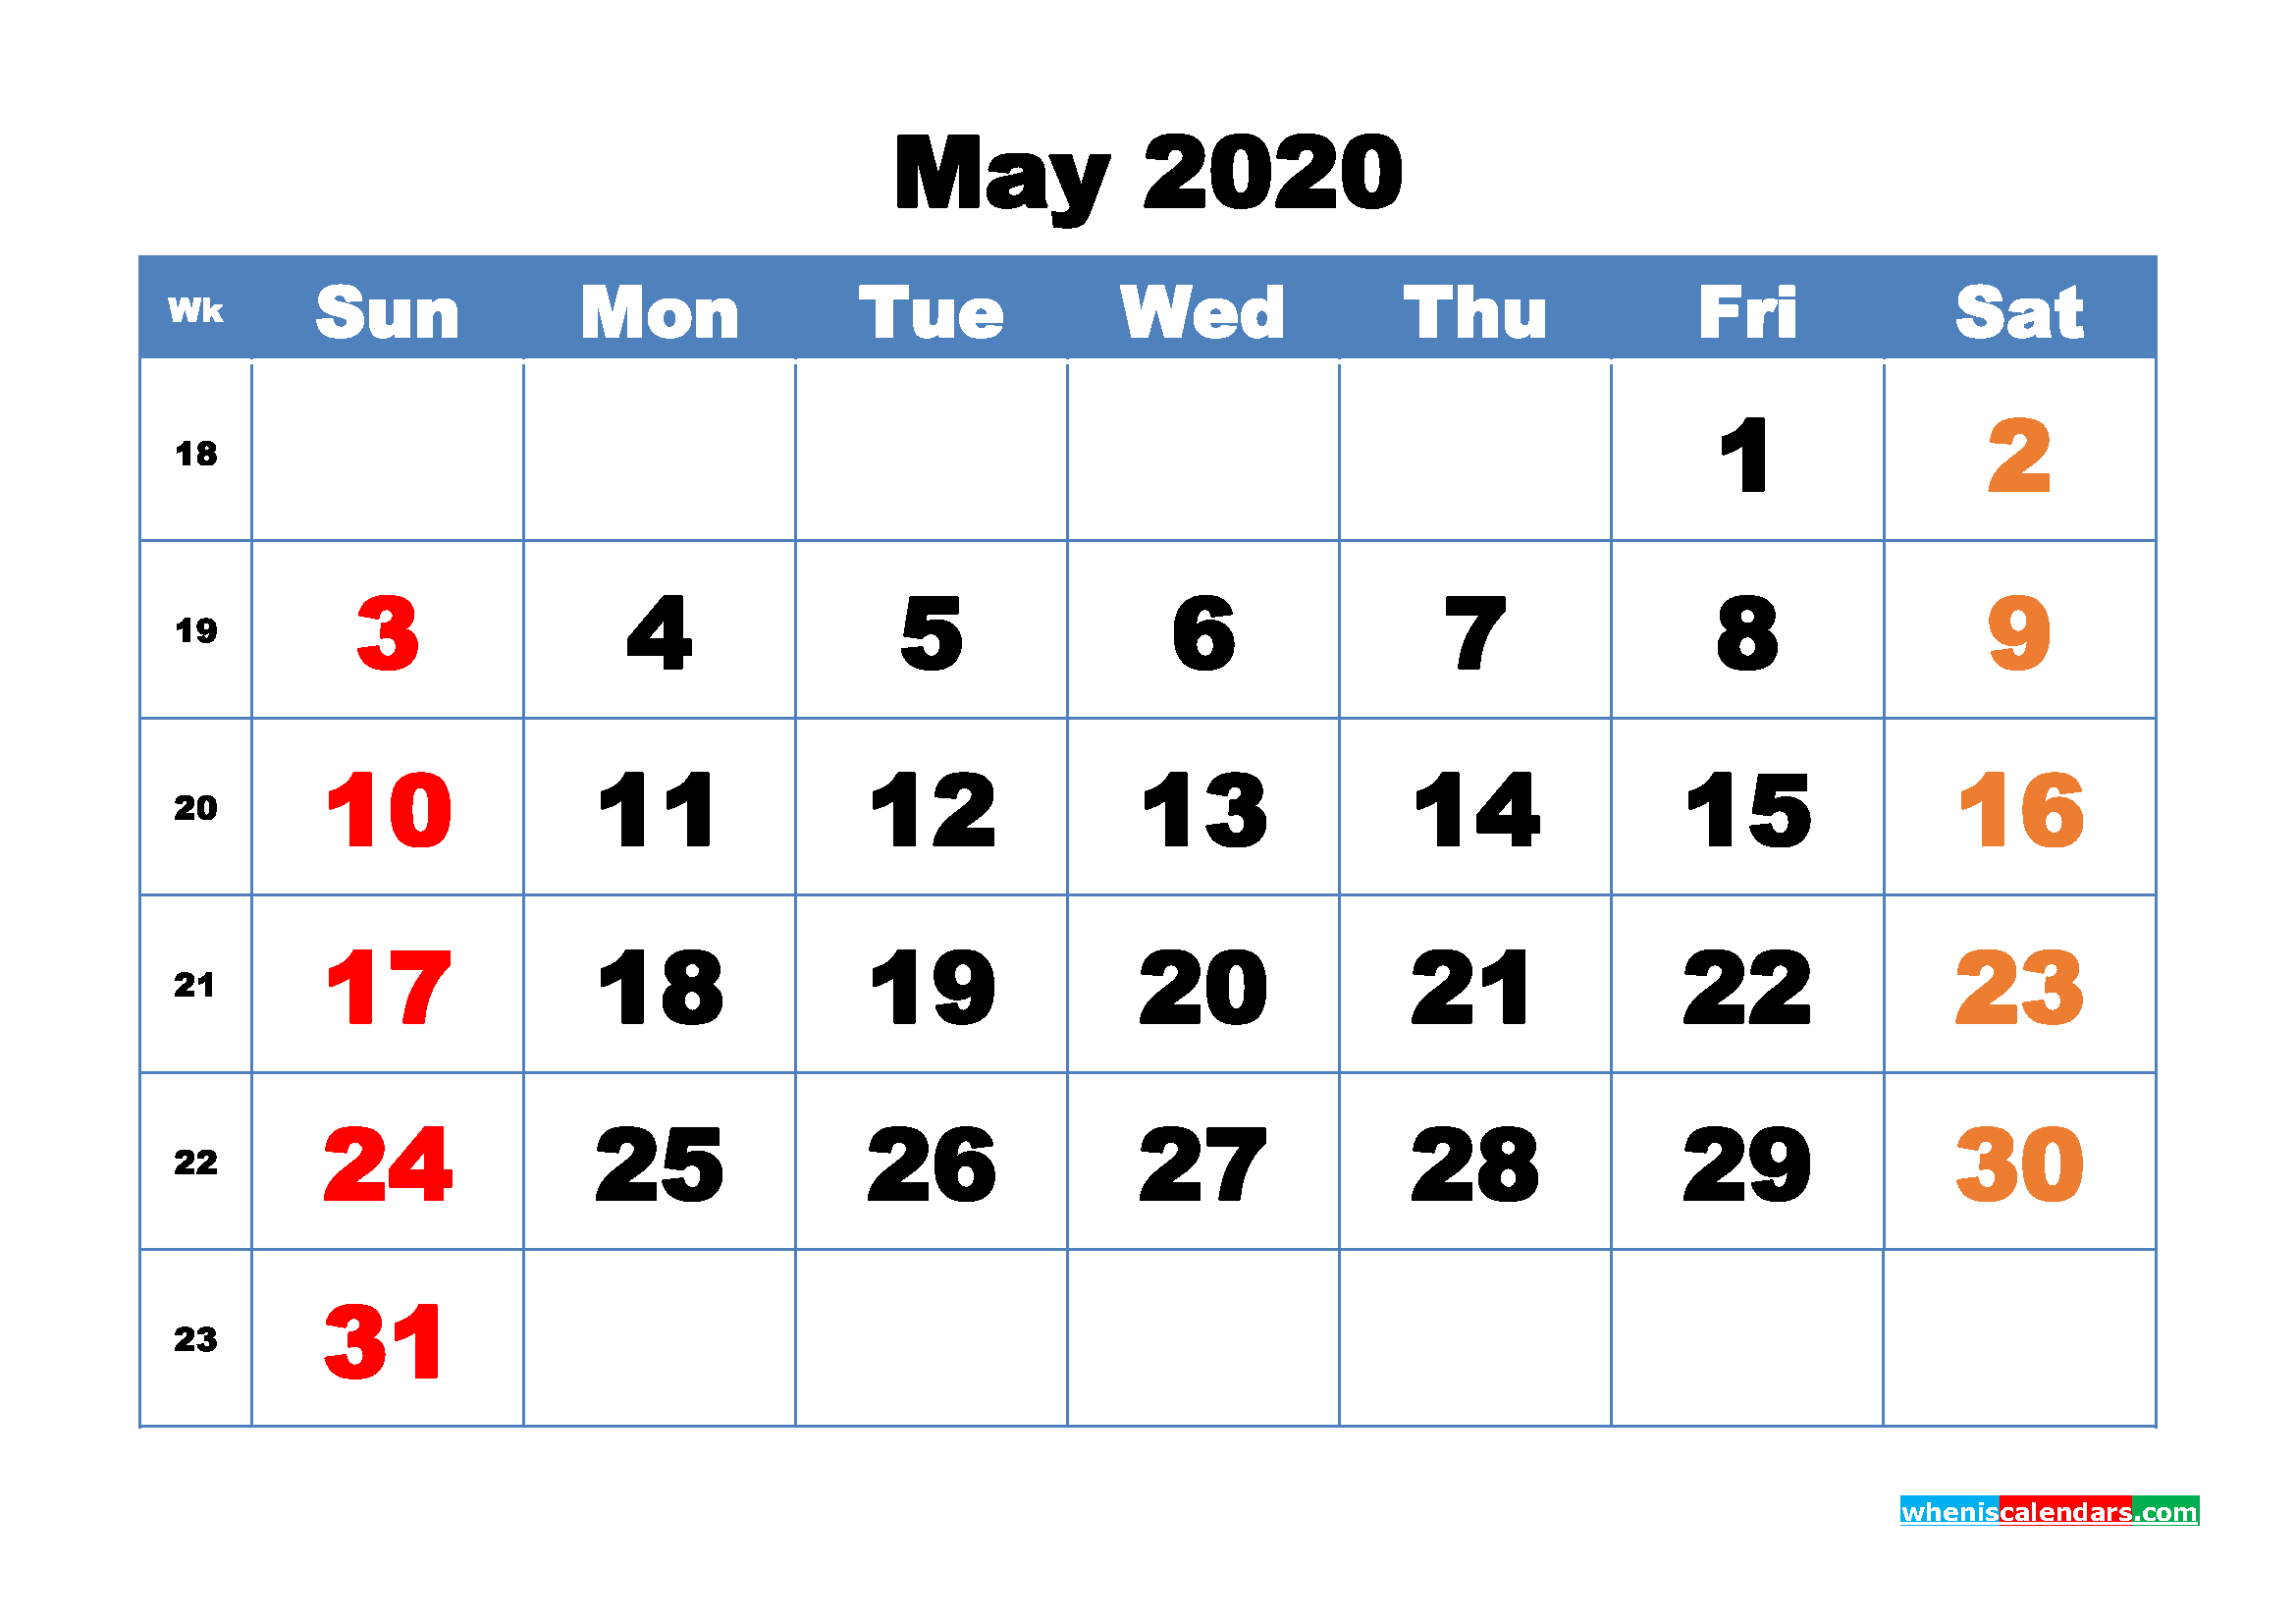 Free Printable May 2020 Calendar - No.m20b317